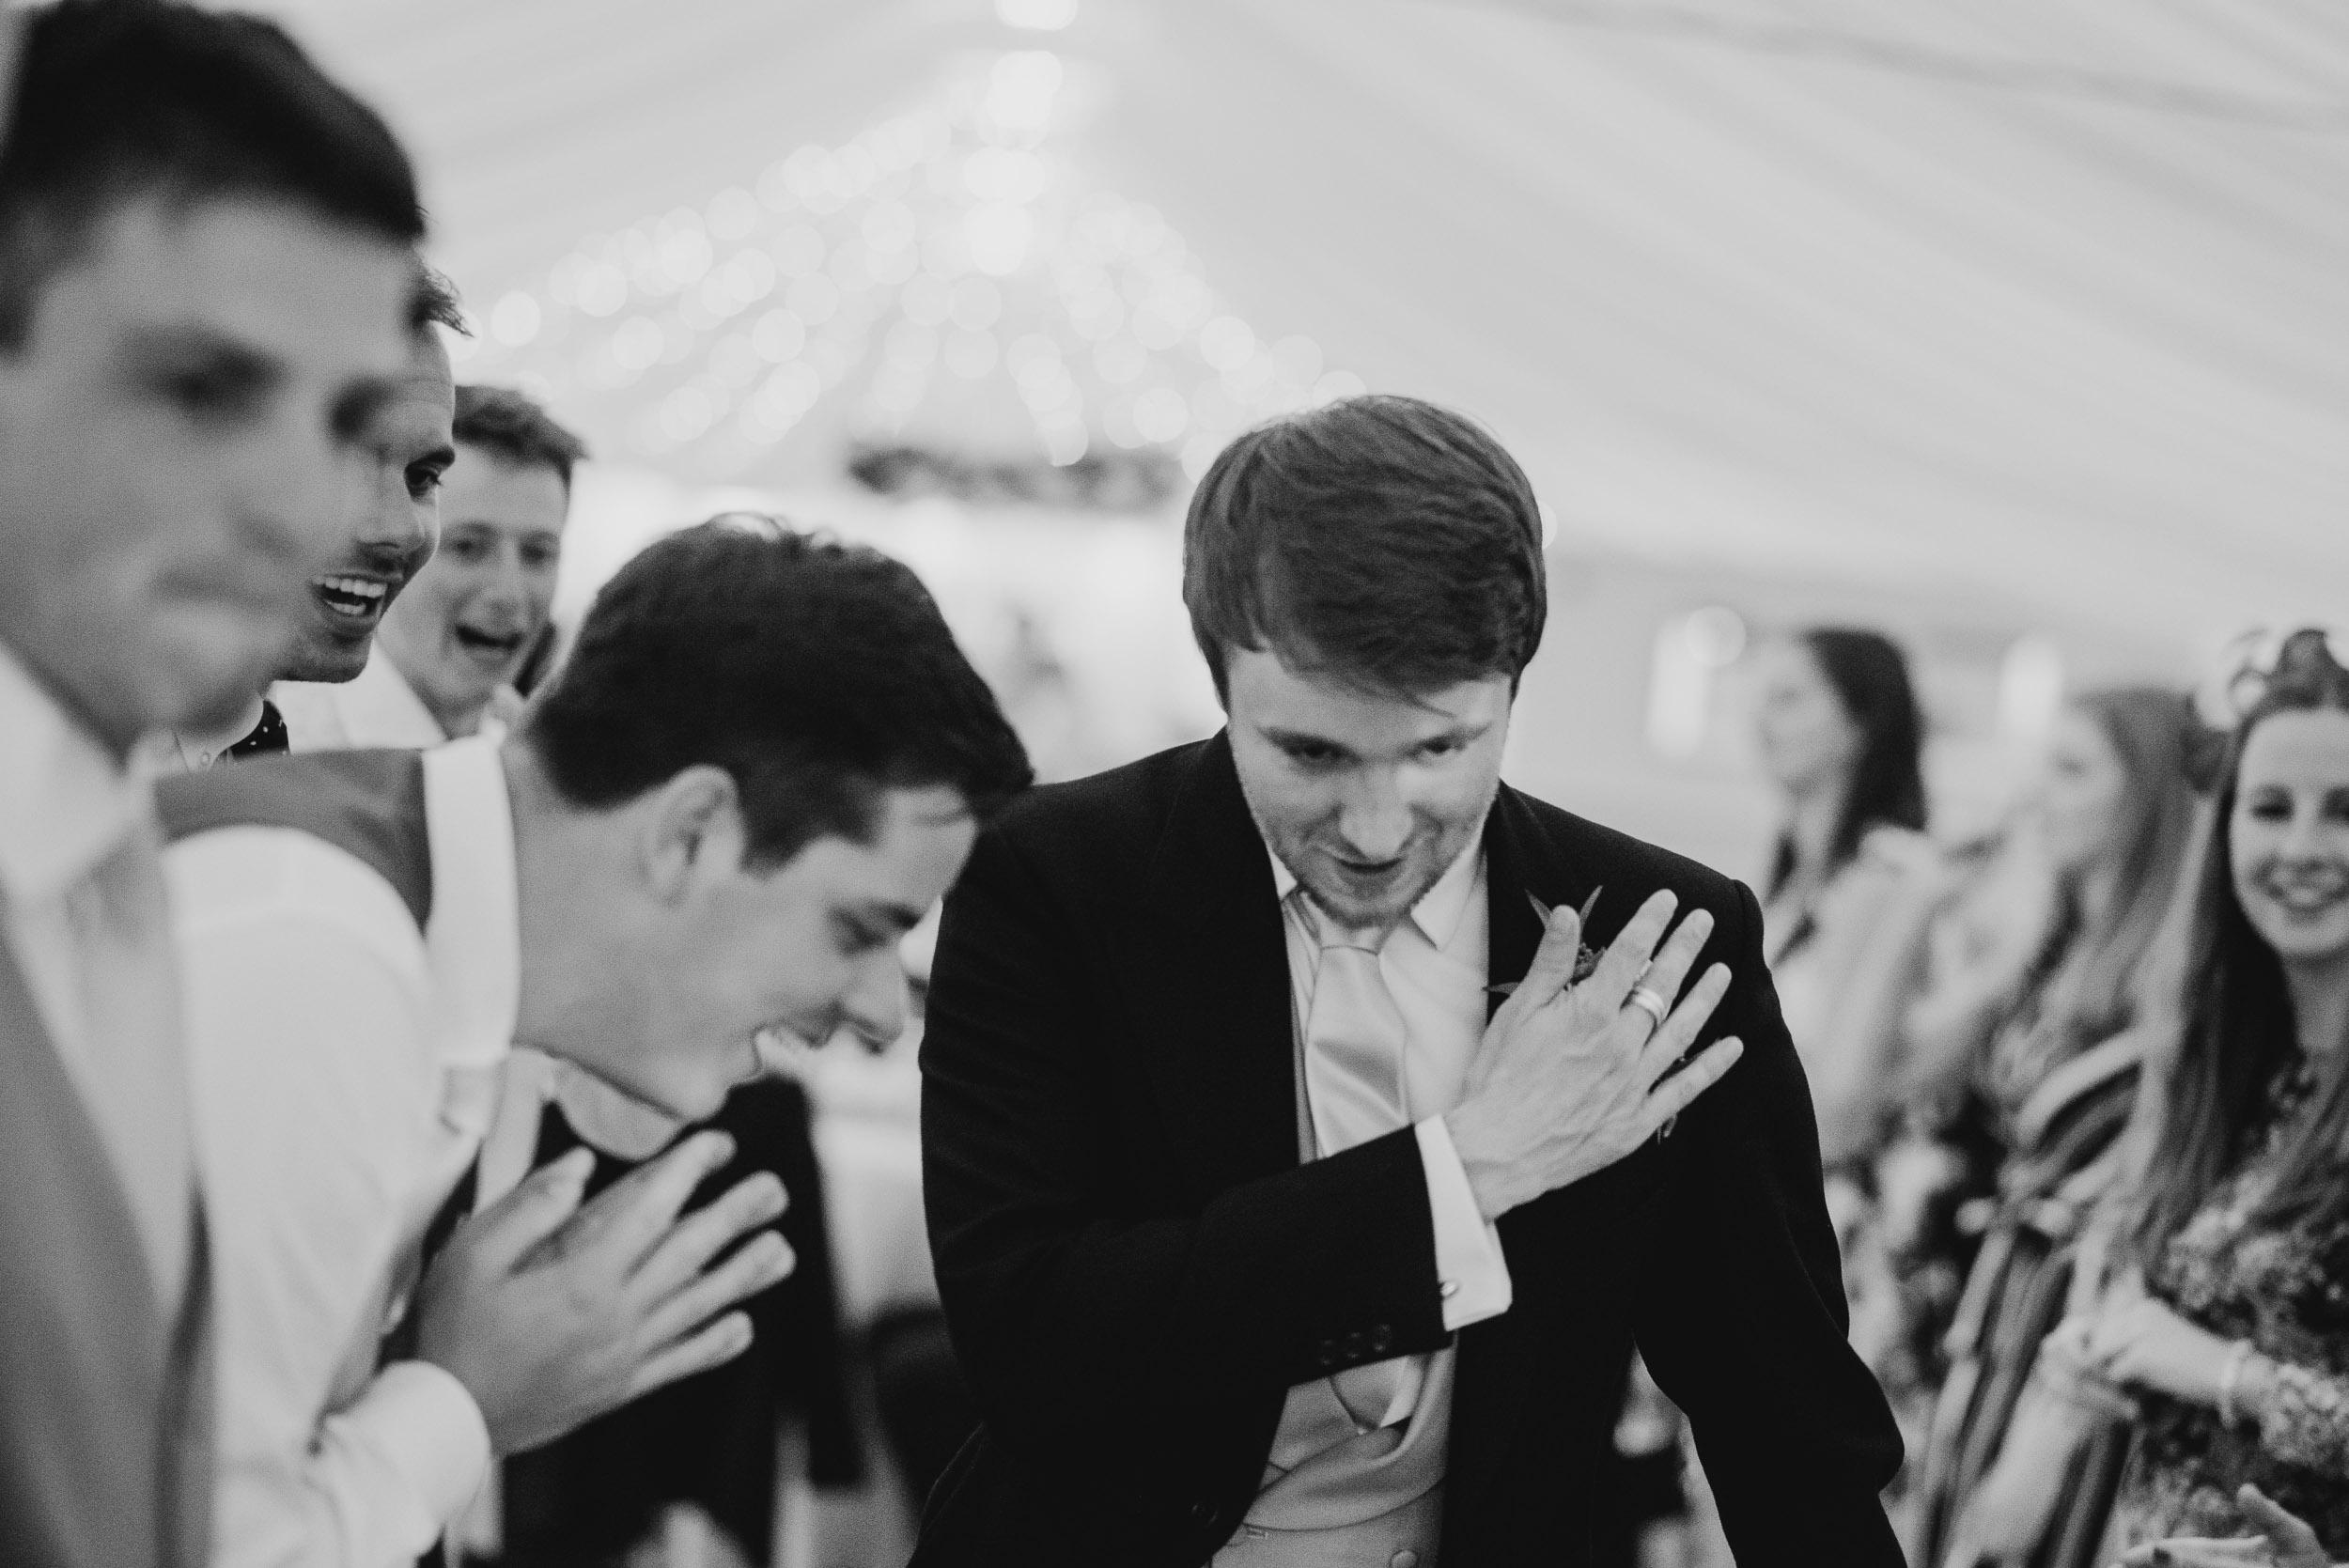 drenagh estate wedding photography-128.jpg